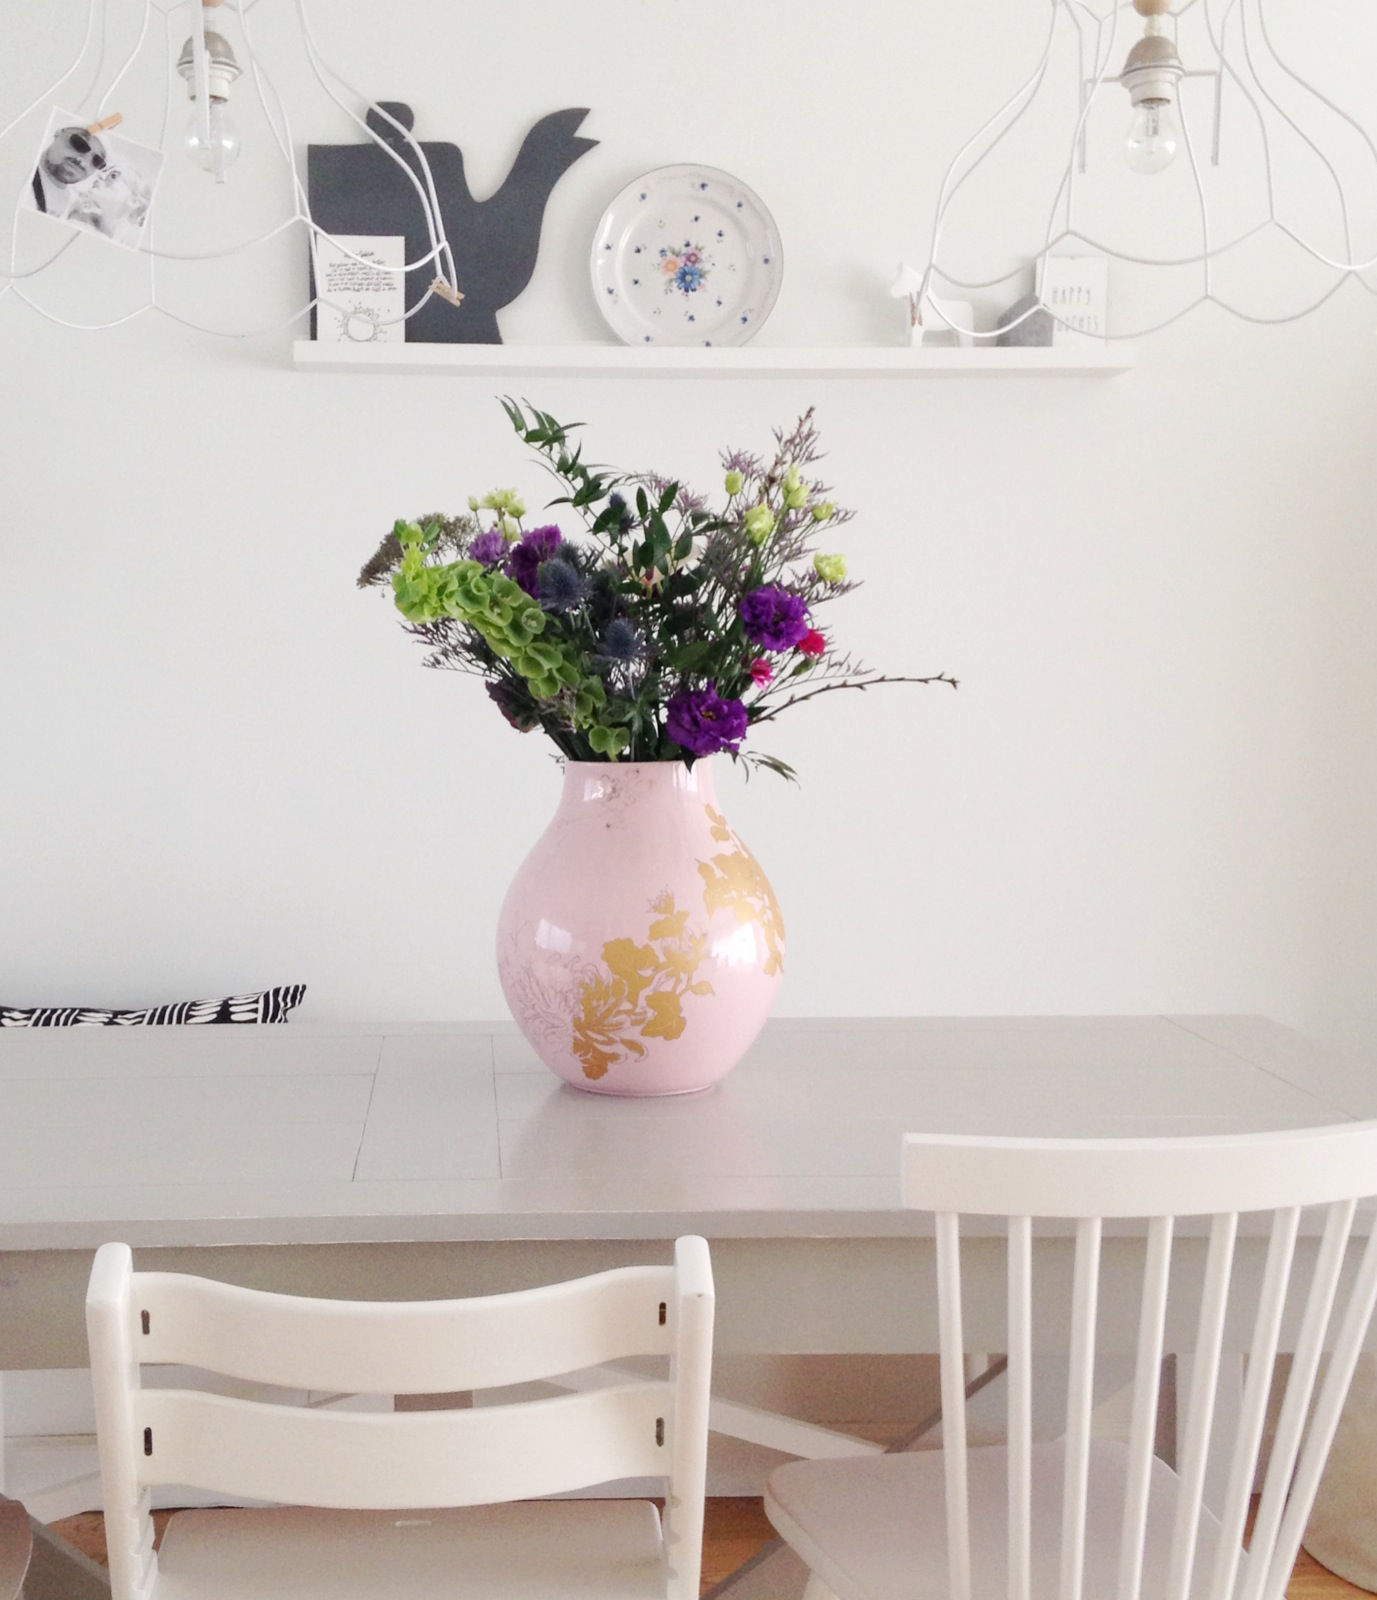 selinesteba.com - Bloomon bloemen bij Seline Steba thuis